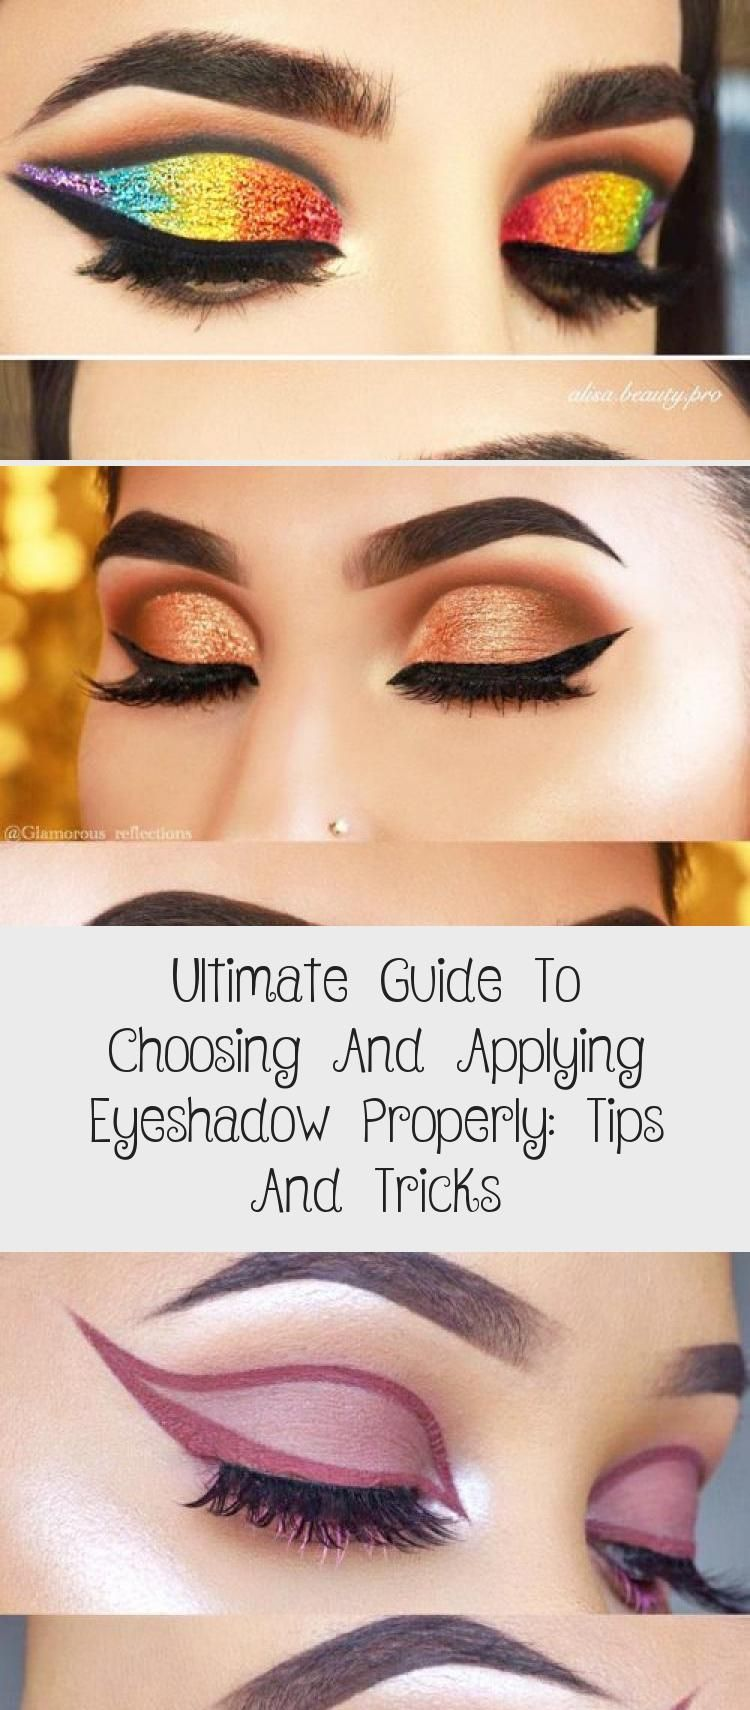 My Blog in 2020 How to apply eyeshadow, Eyeshadow guide